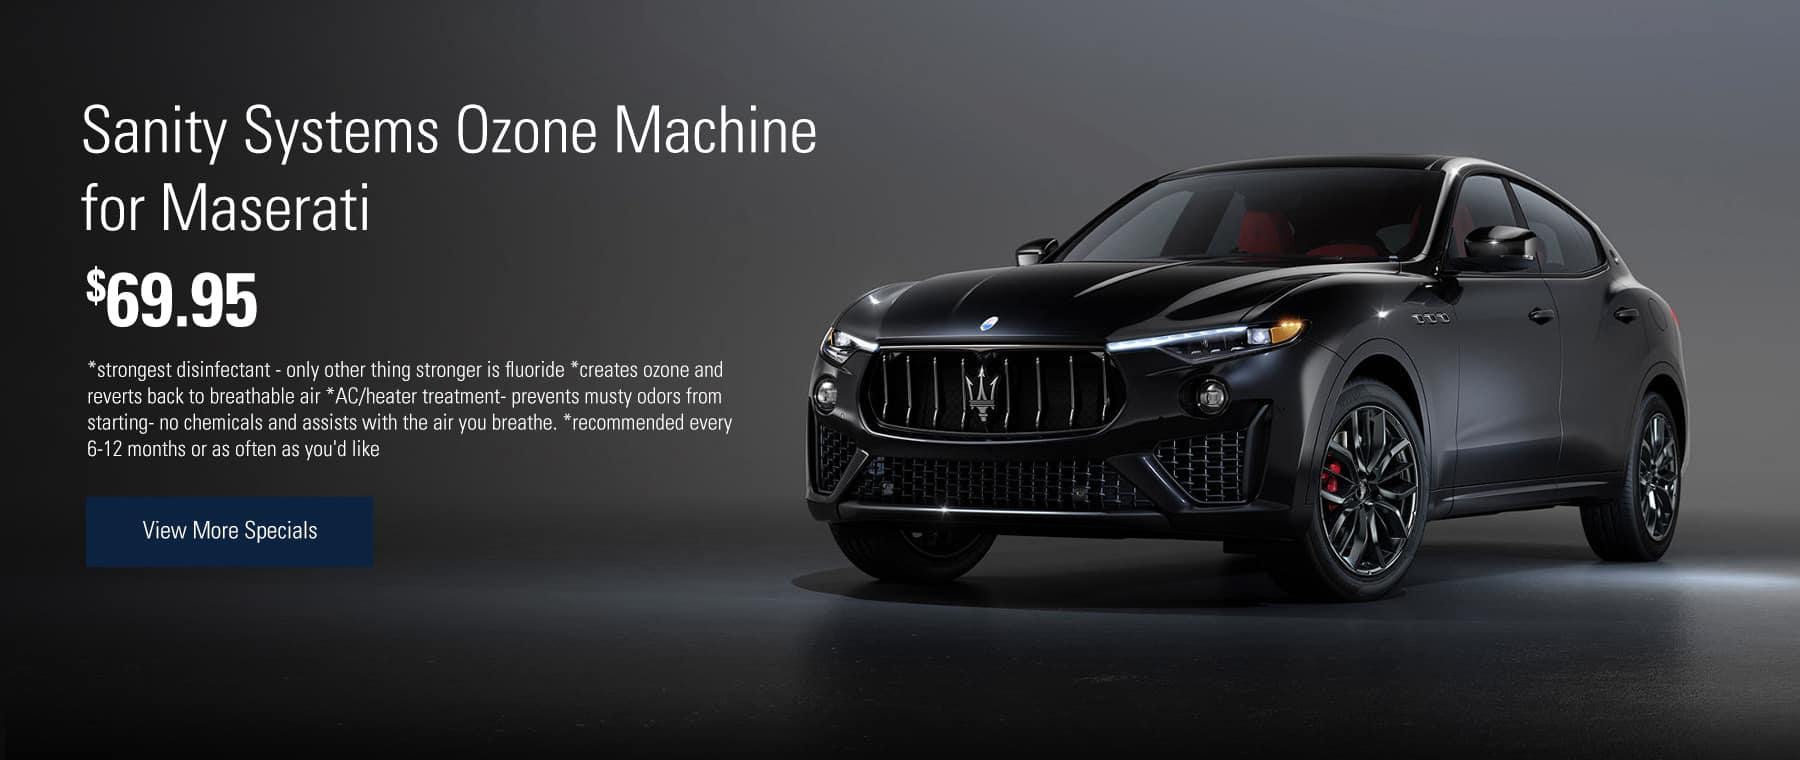 Sanity Systems Ozone Machine for Maserati